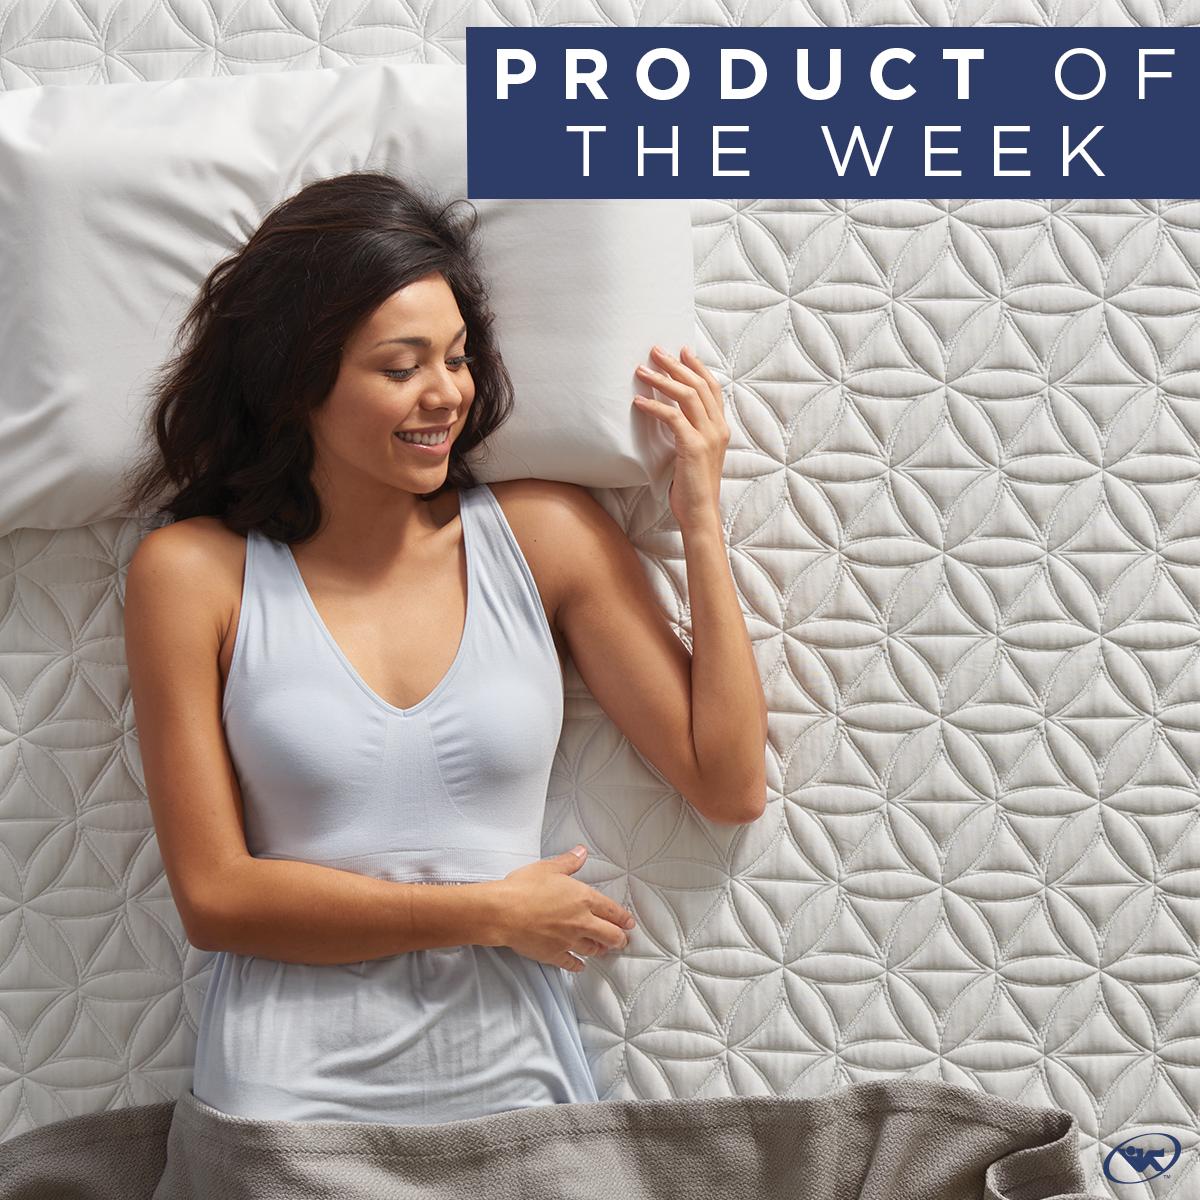 Tempur Essential Pillow helps you sleep